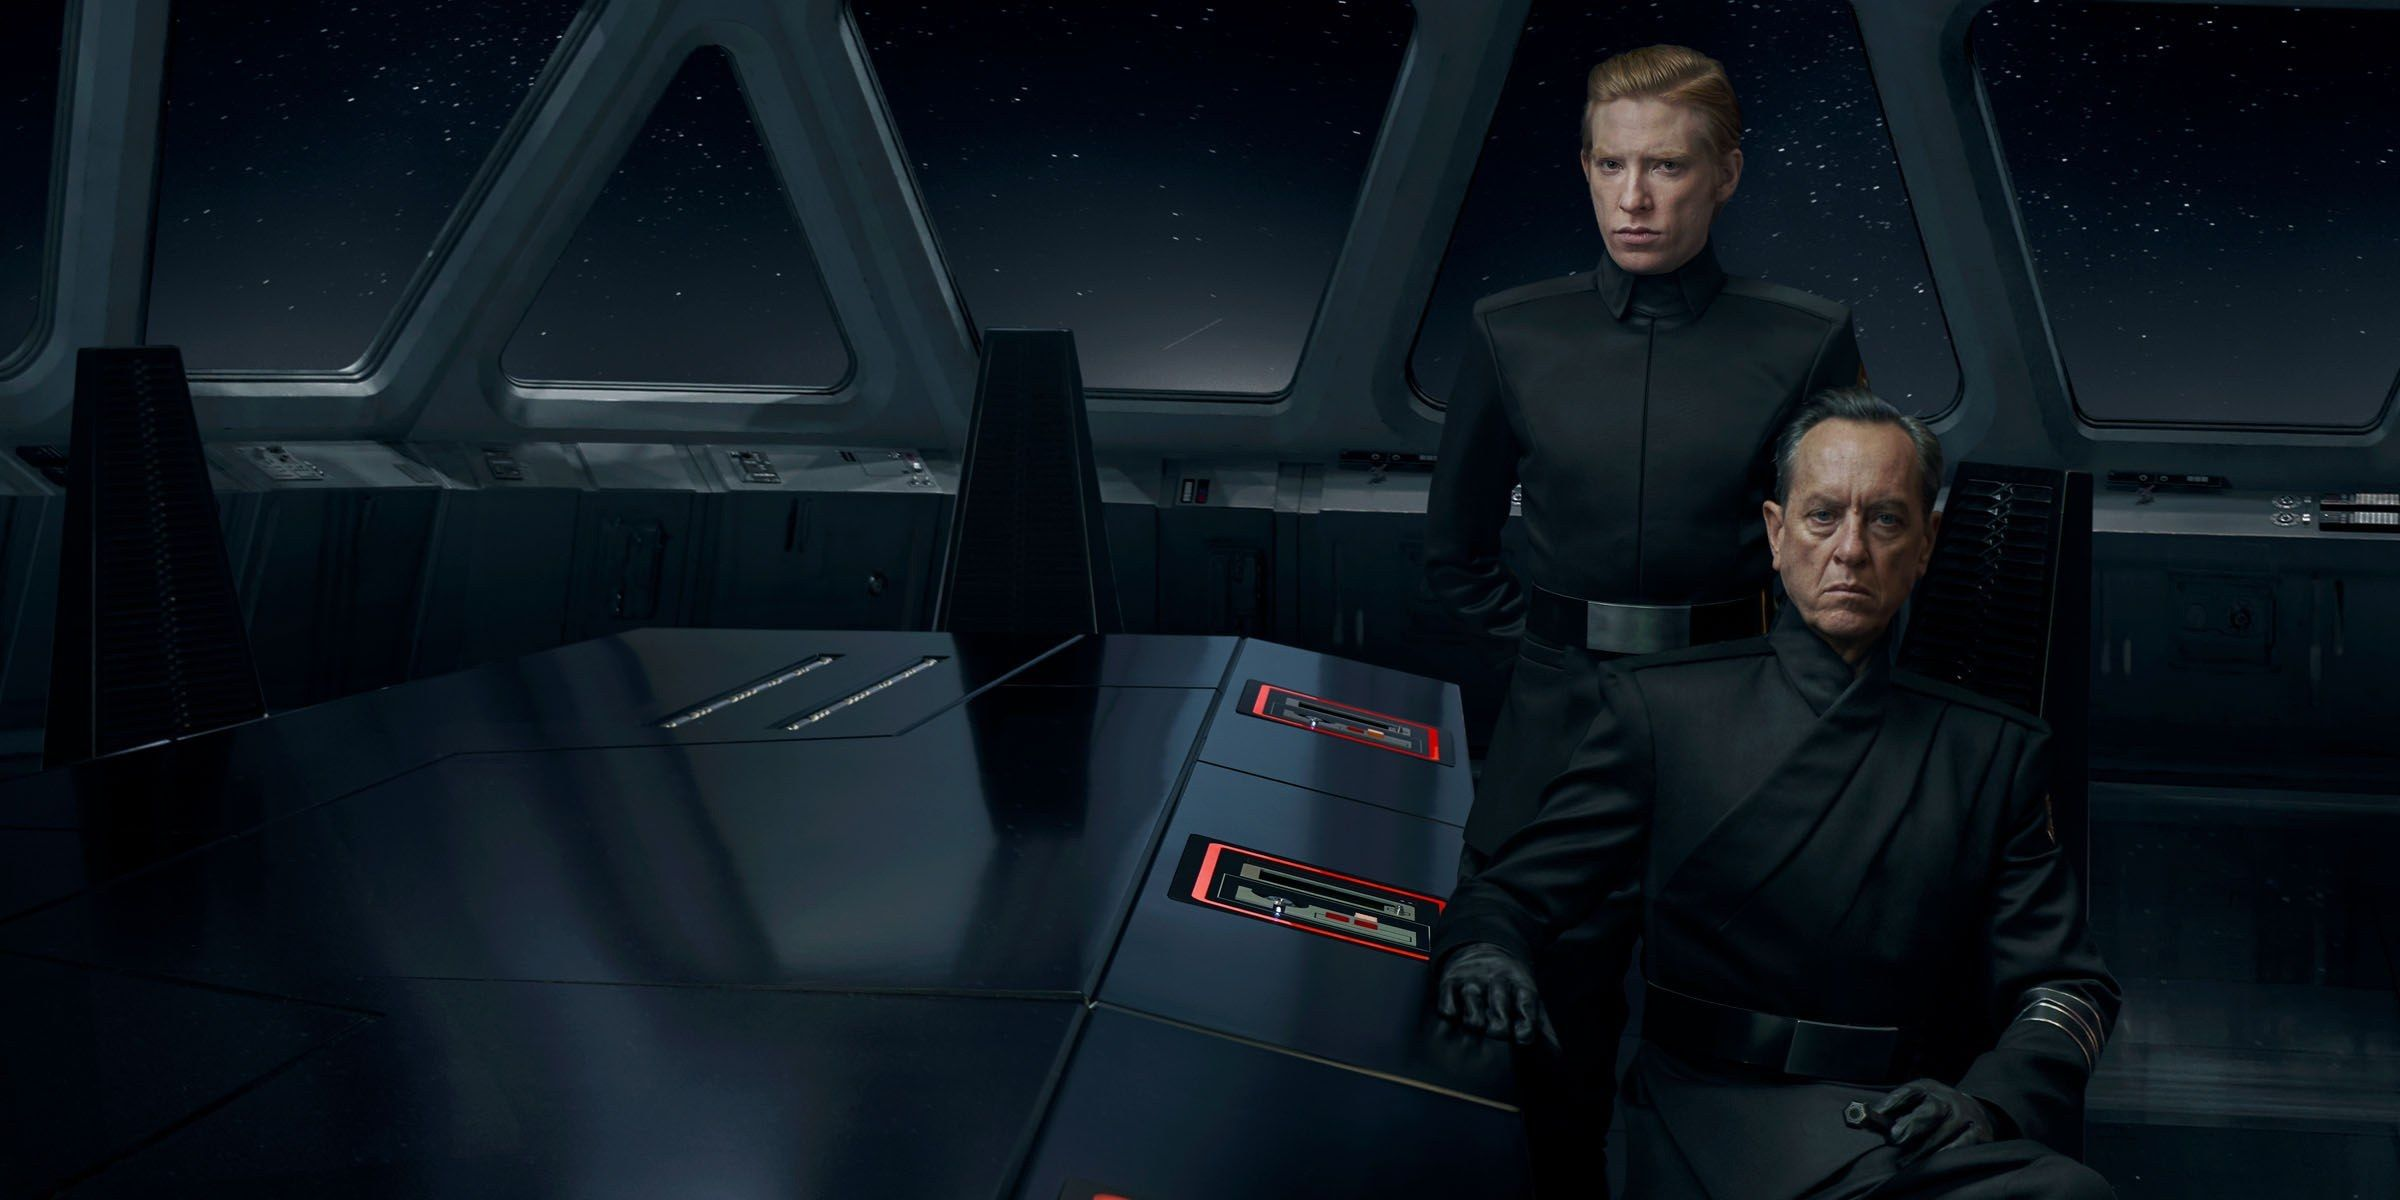 Star Wars Villain Teases Rise of Skywalker Twist Nine Movies In the Making